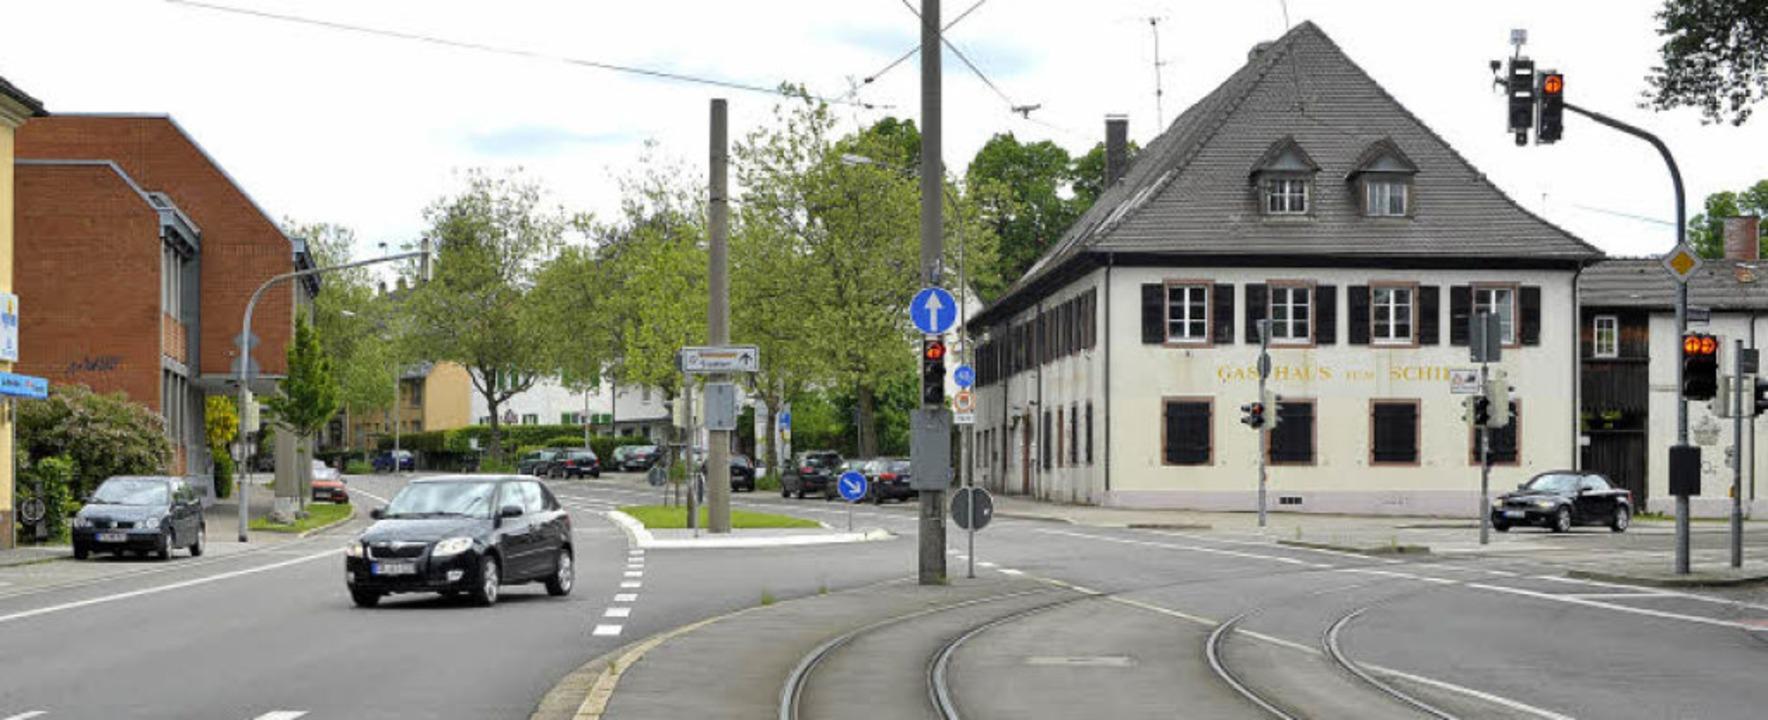 Neue Perspektive an der Schwarzwaldstr...urückversetzt ein Geschäftsgebäude.     | Foto: Michael Bamberger